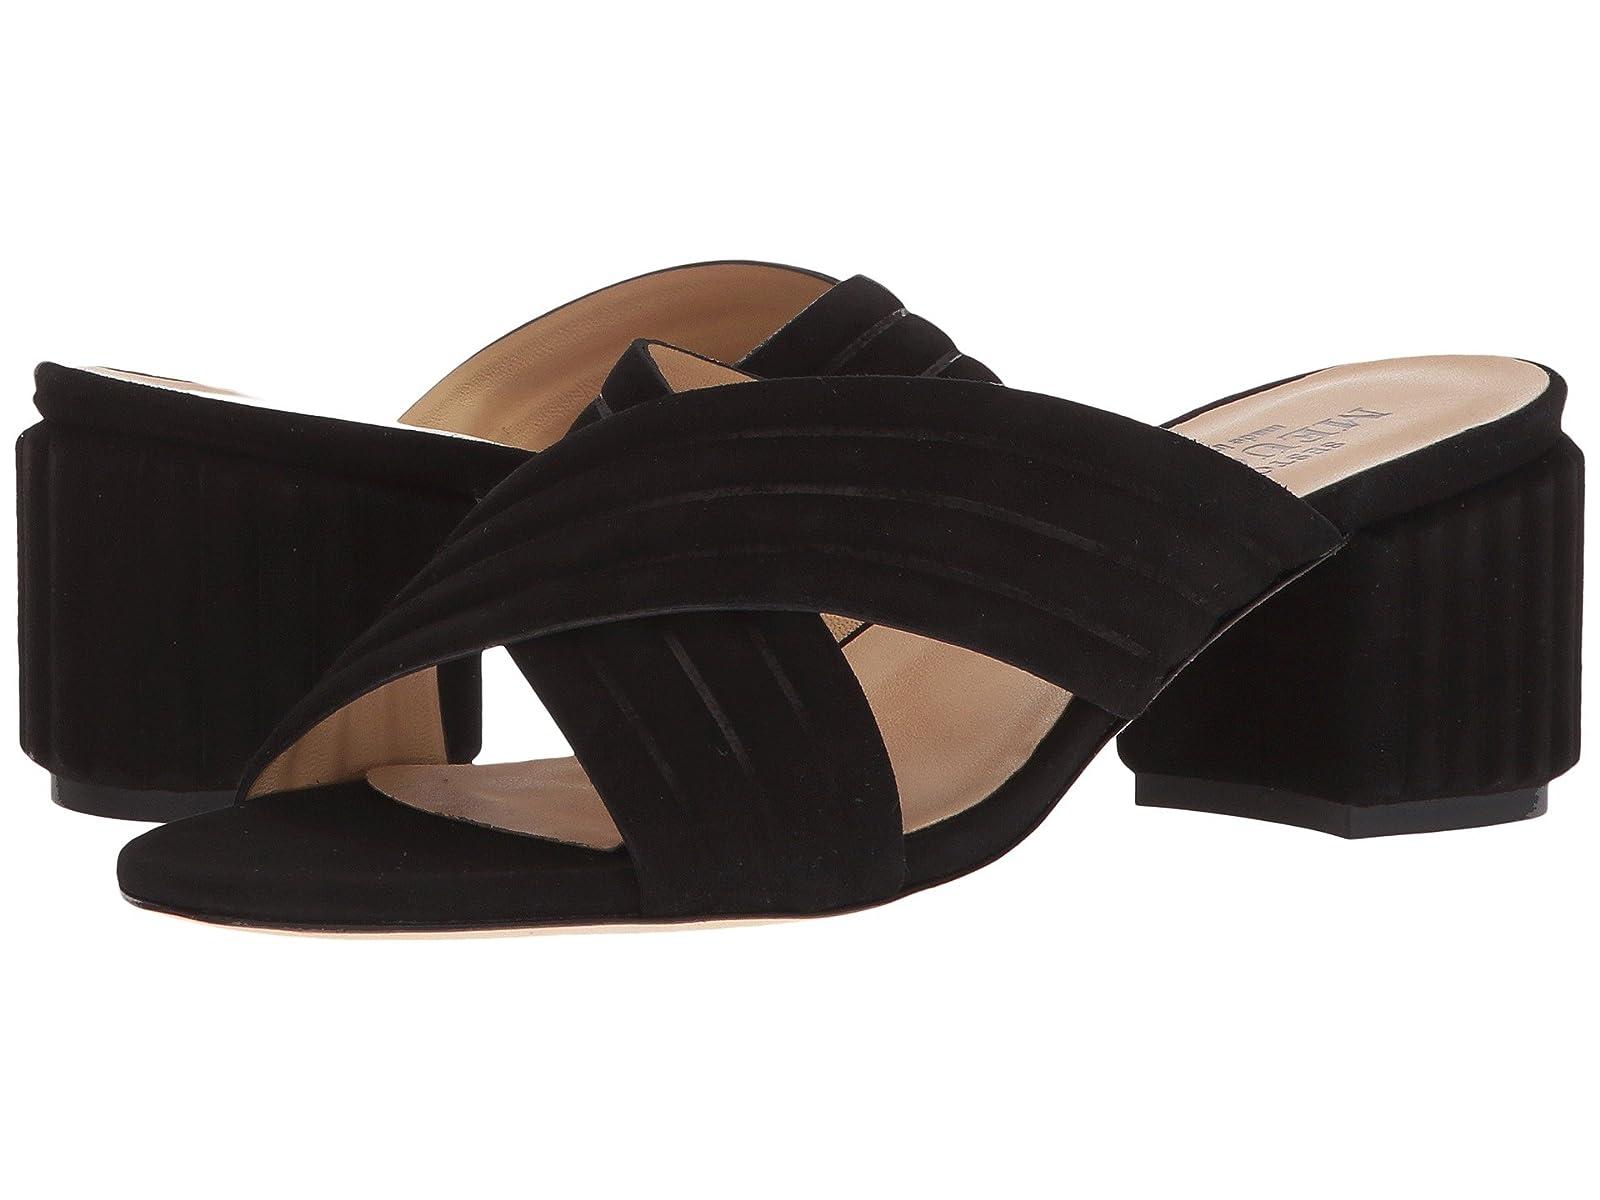 Sesto Meucci MalagaCheap and distinctive eye-catching shoes